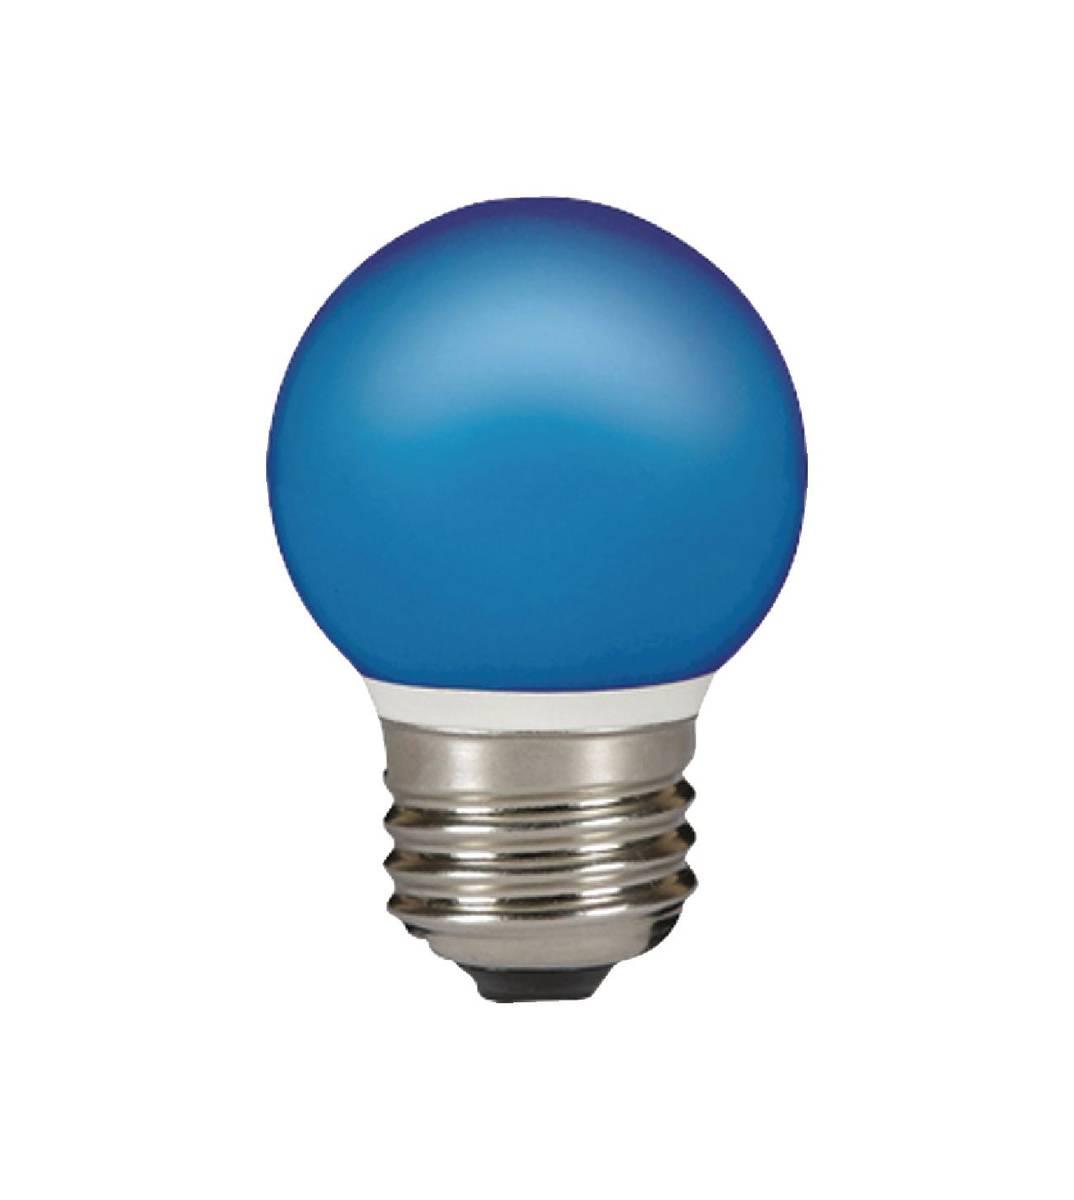 LED-Lamppu E27 Minipallo 0.5 W 80 lm - DigiMesta.com verkkokauppa